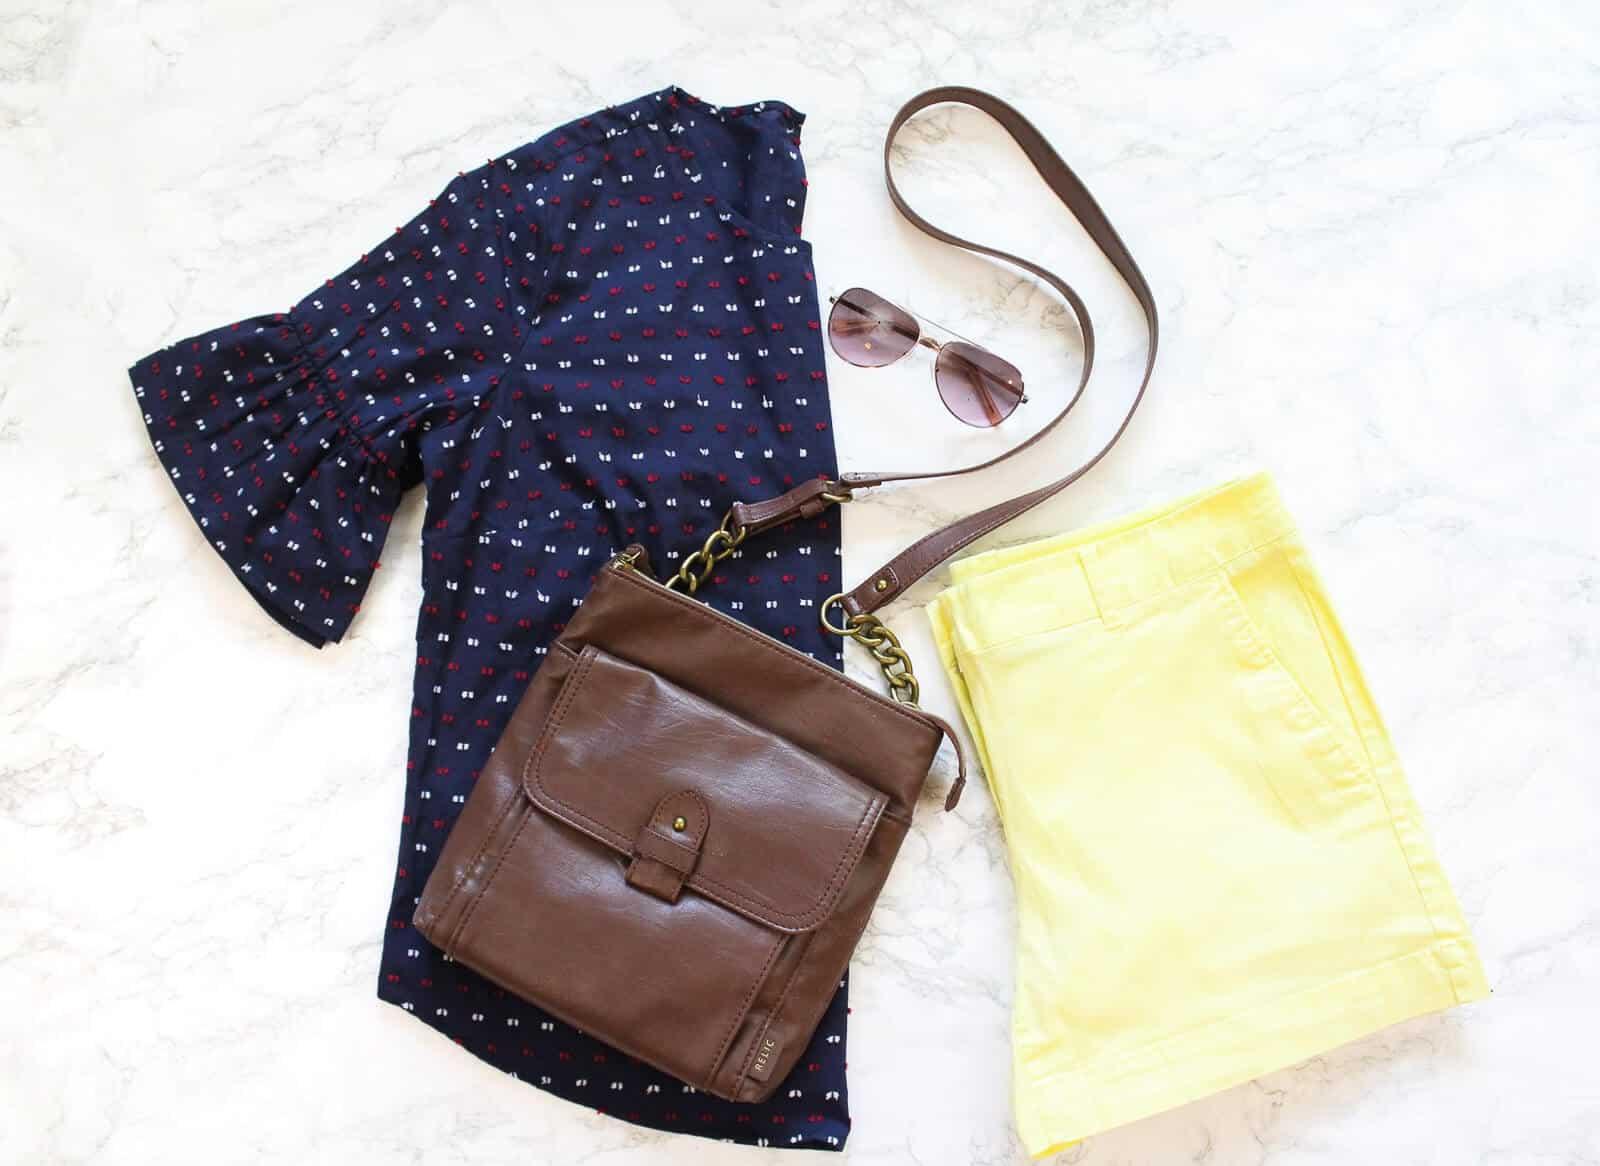 5 Summer Fashion Essentials + Where to Find Great Deals on Them!